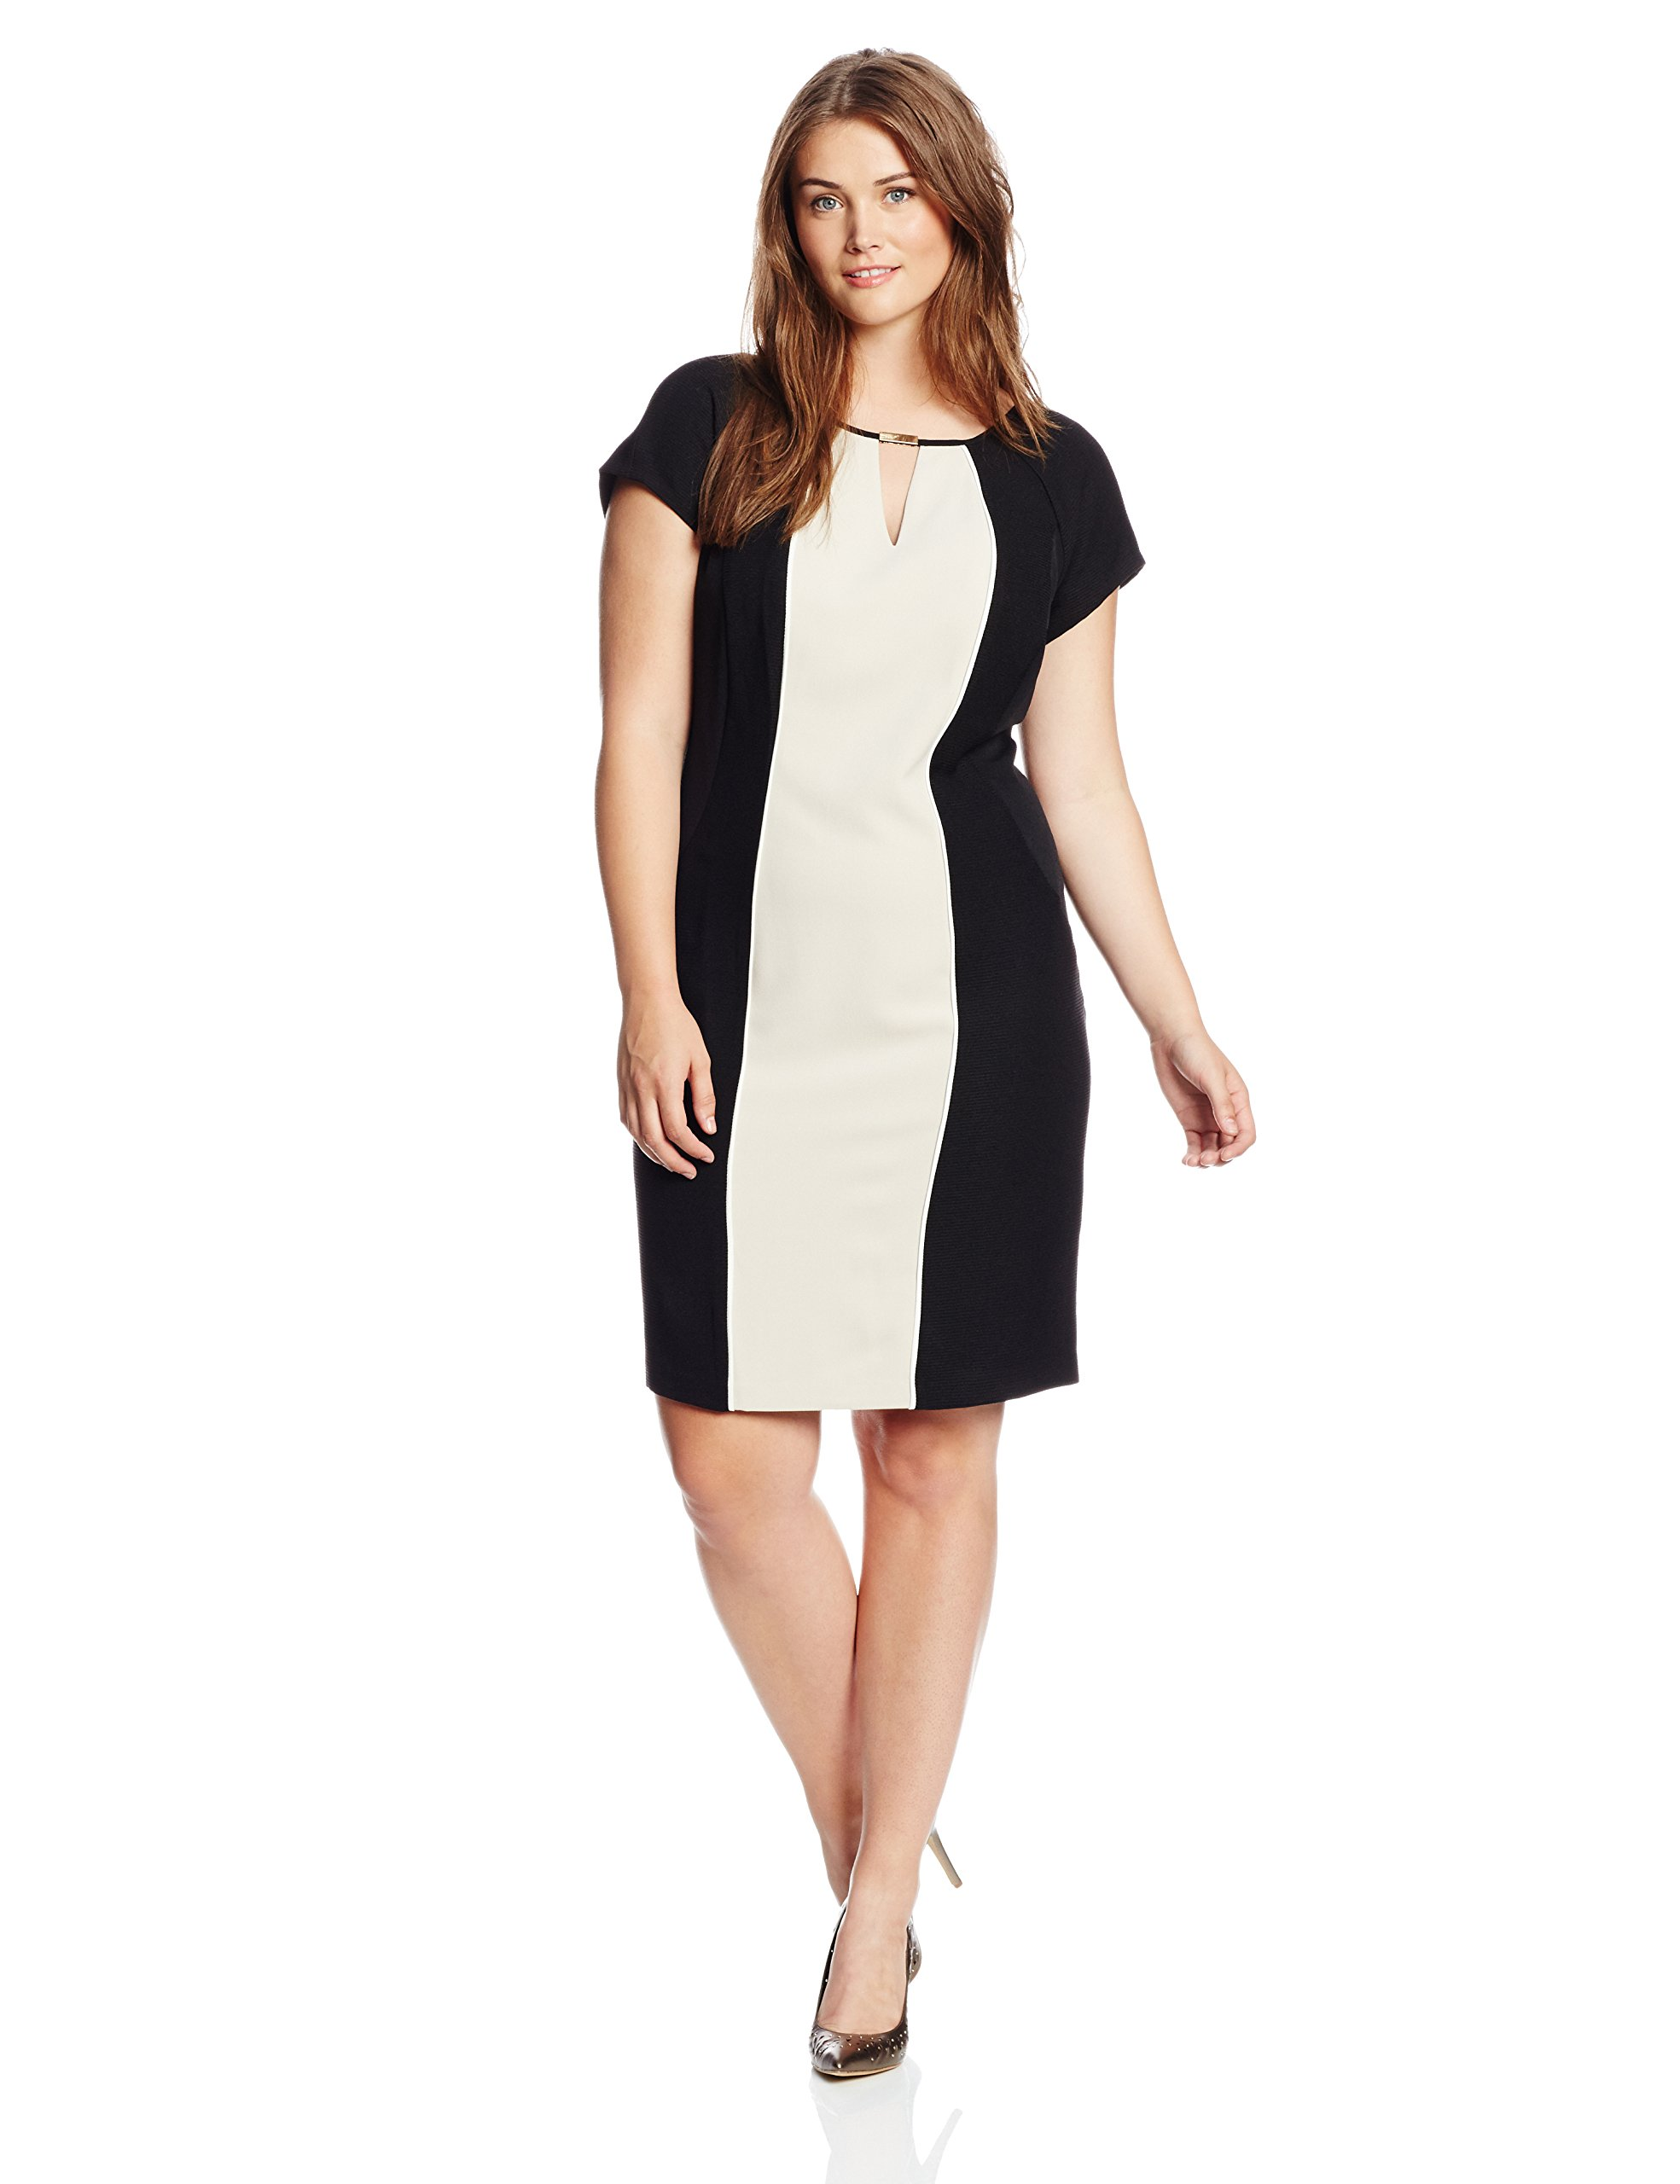 Sandra Darren Women's Plus-Size Color Block Dress in Champagne and Black